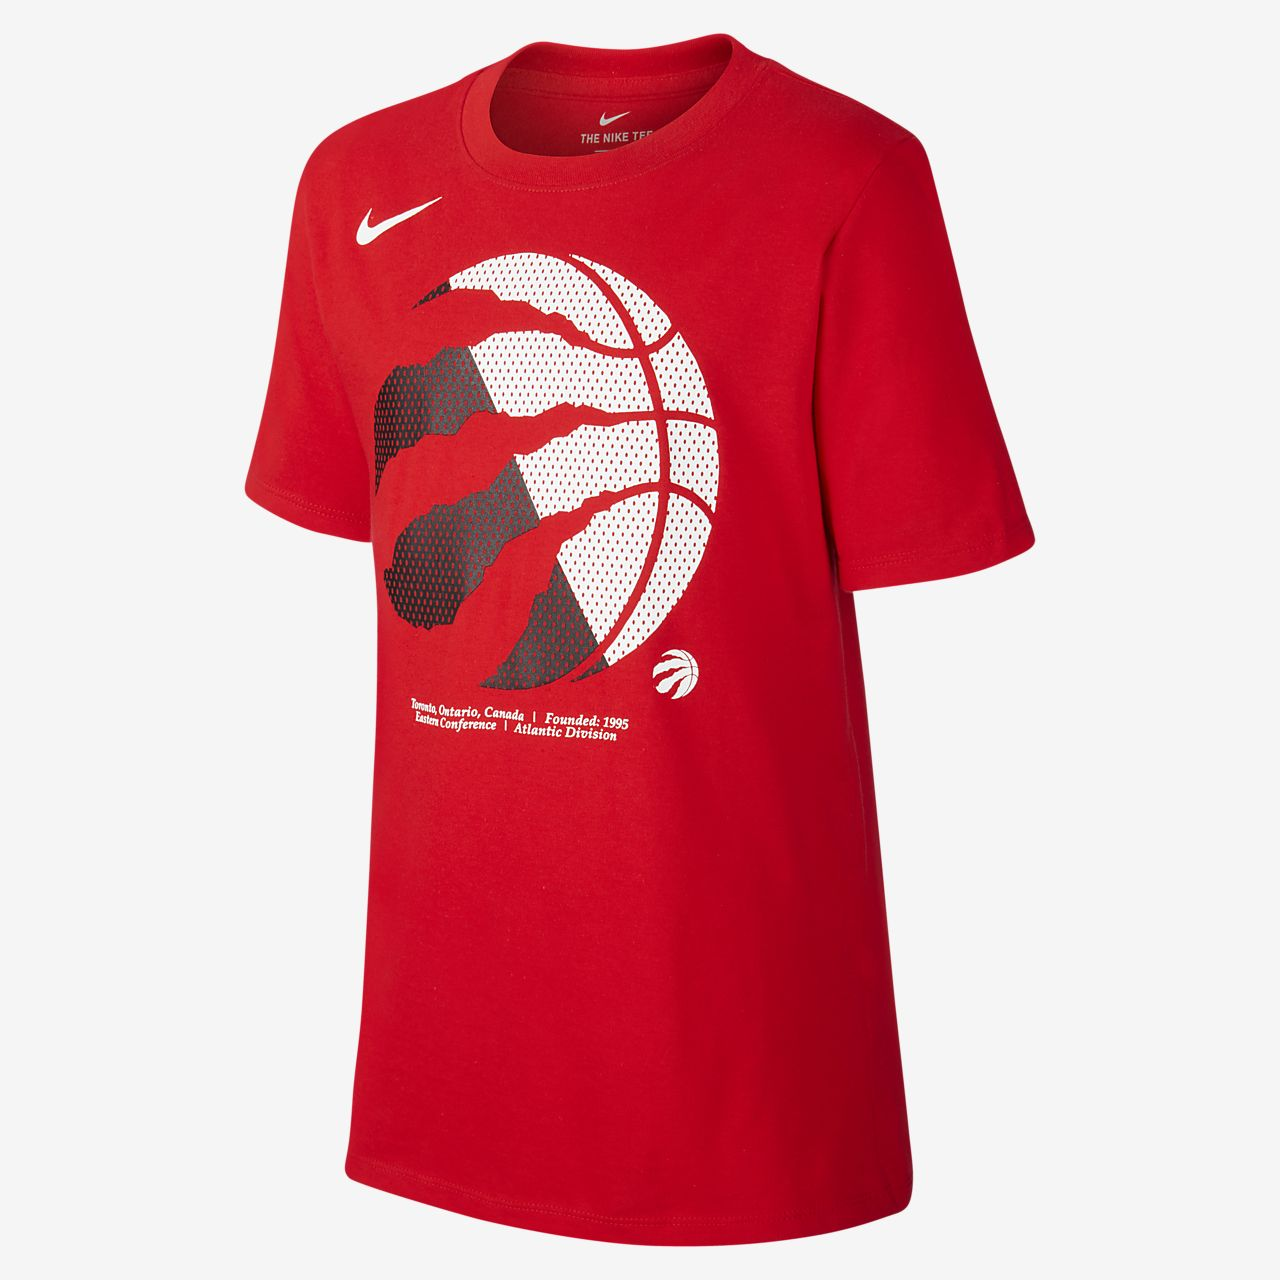 Raptors Logo Camiseta Nike Dri FIT NBA Niñoa